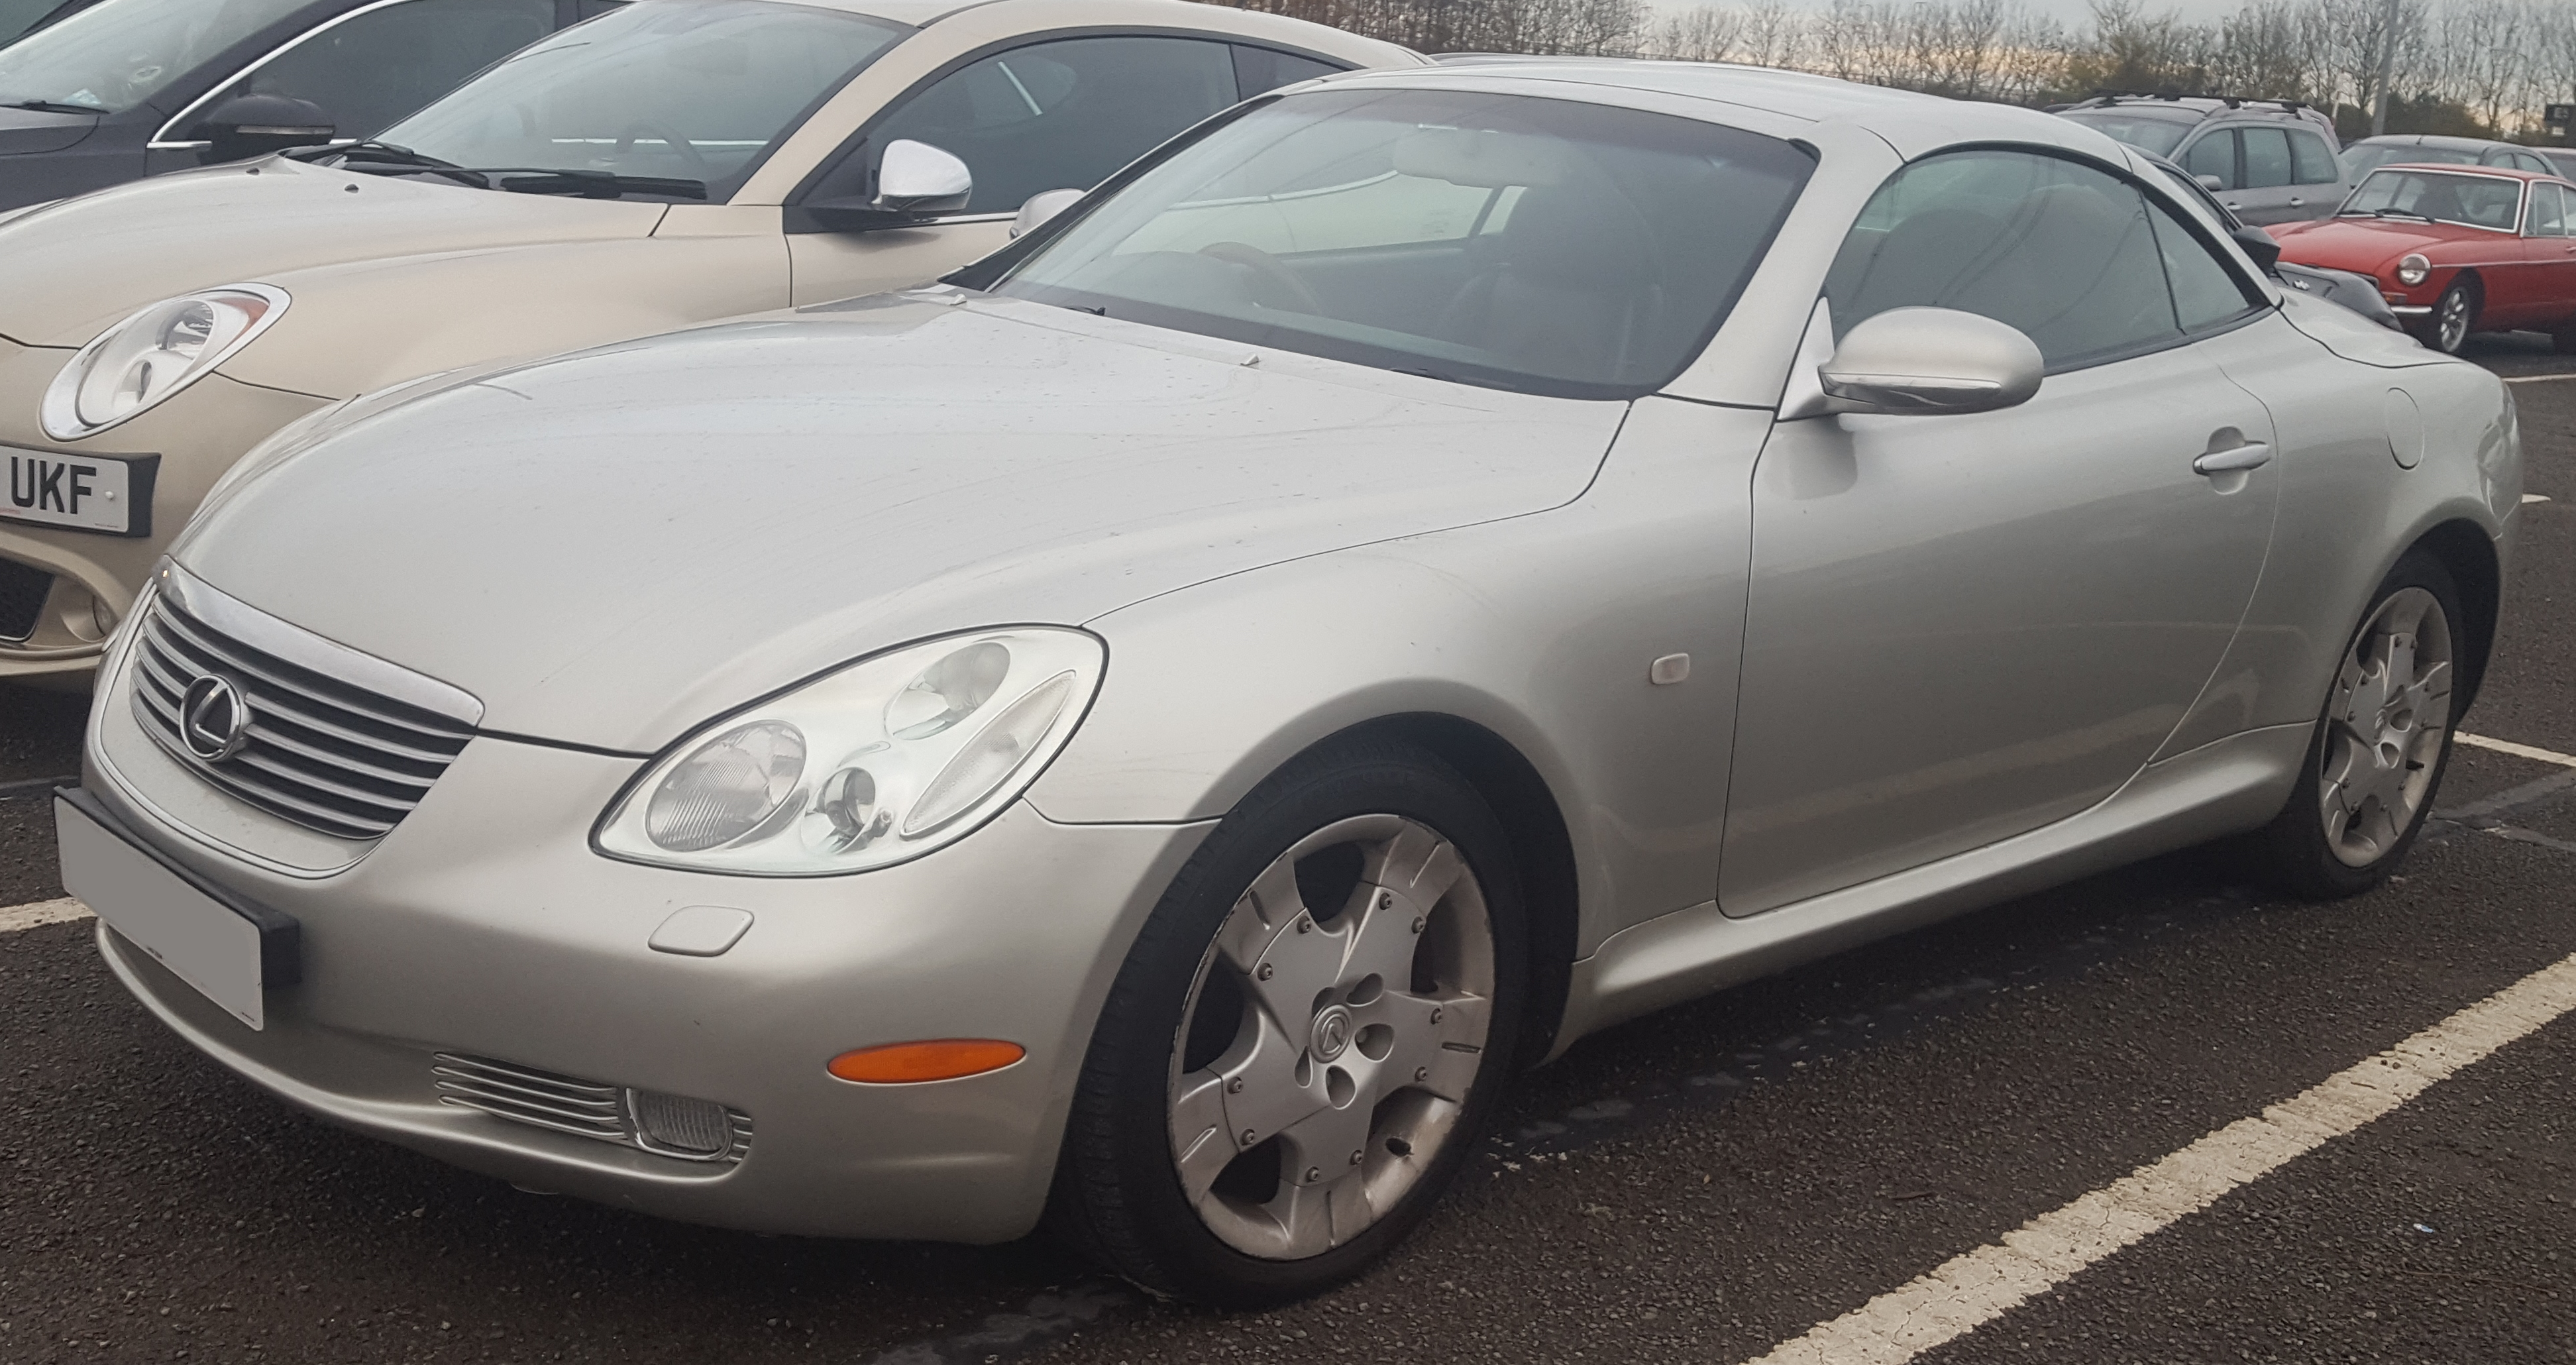 https://upload.wikimedia.org/wikipedia/commons/d/d5/2002_Lexus_SC430_Automatic_4.3_Front.jpg